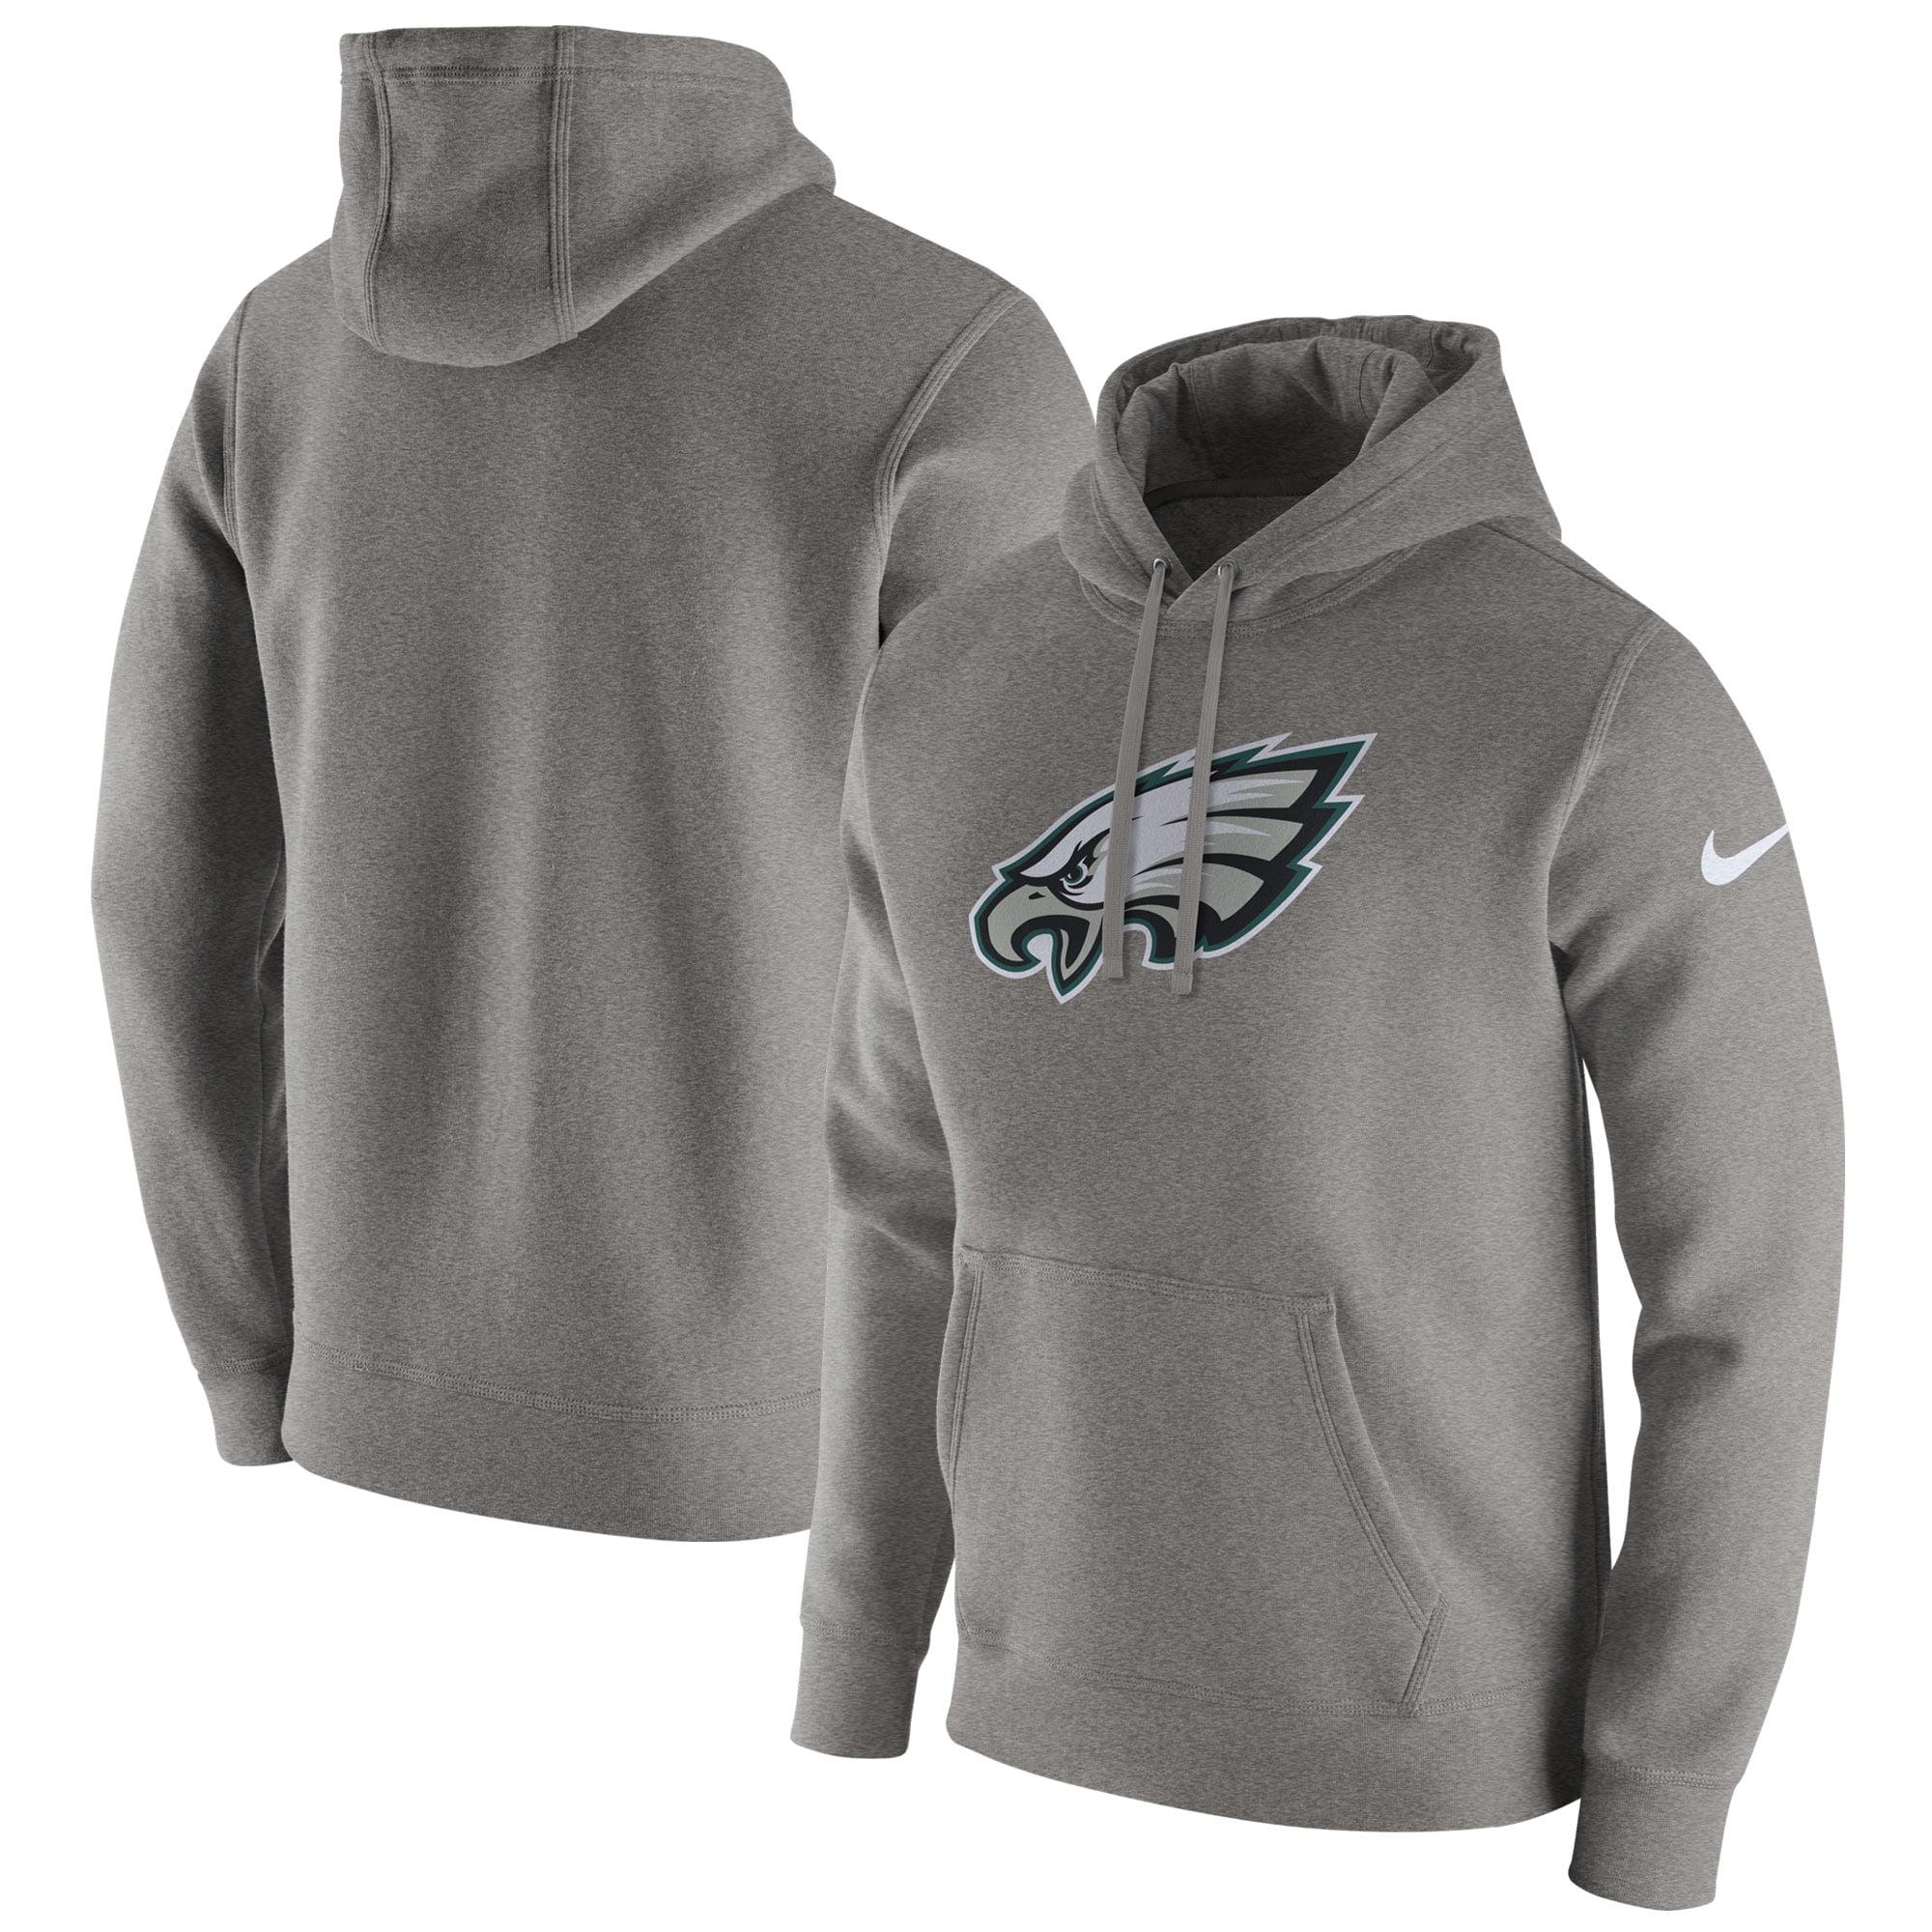 Philadelphia Eagles Nike Club Fleece Pullover Hoodie - Heathered Gray